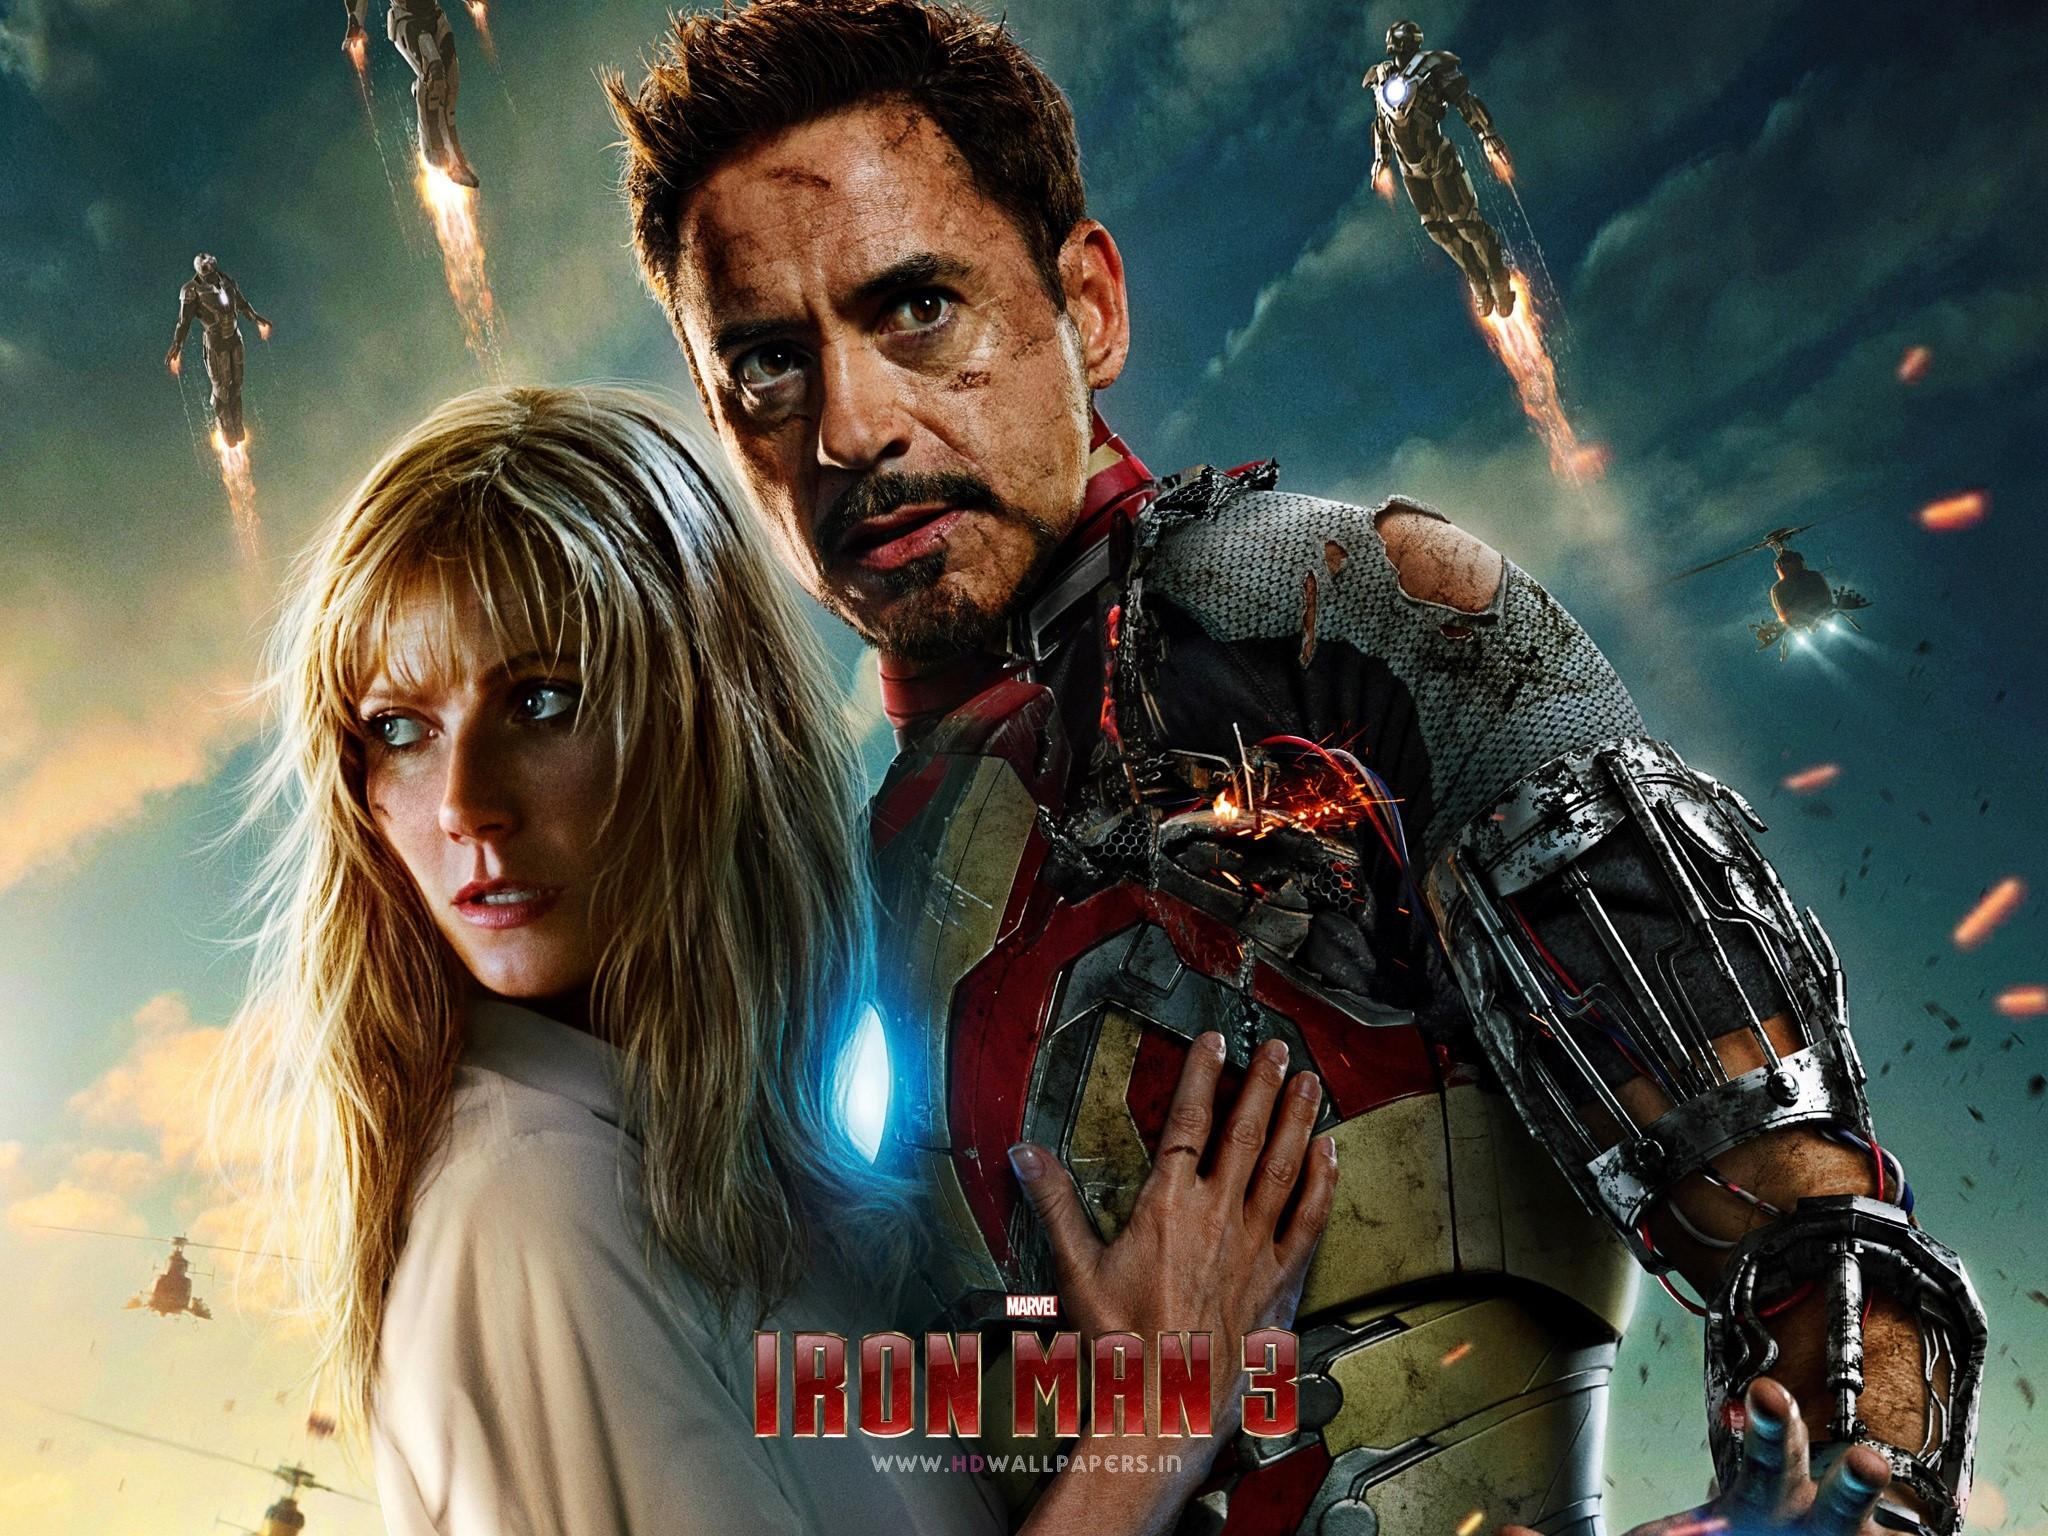 Wallpaper Robert Downey Jr in Iron Man 3